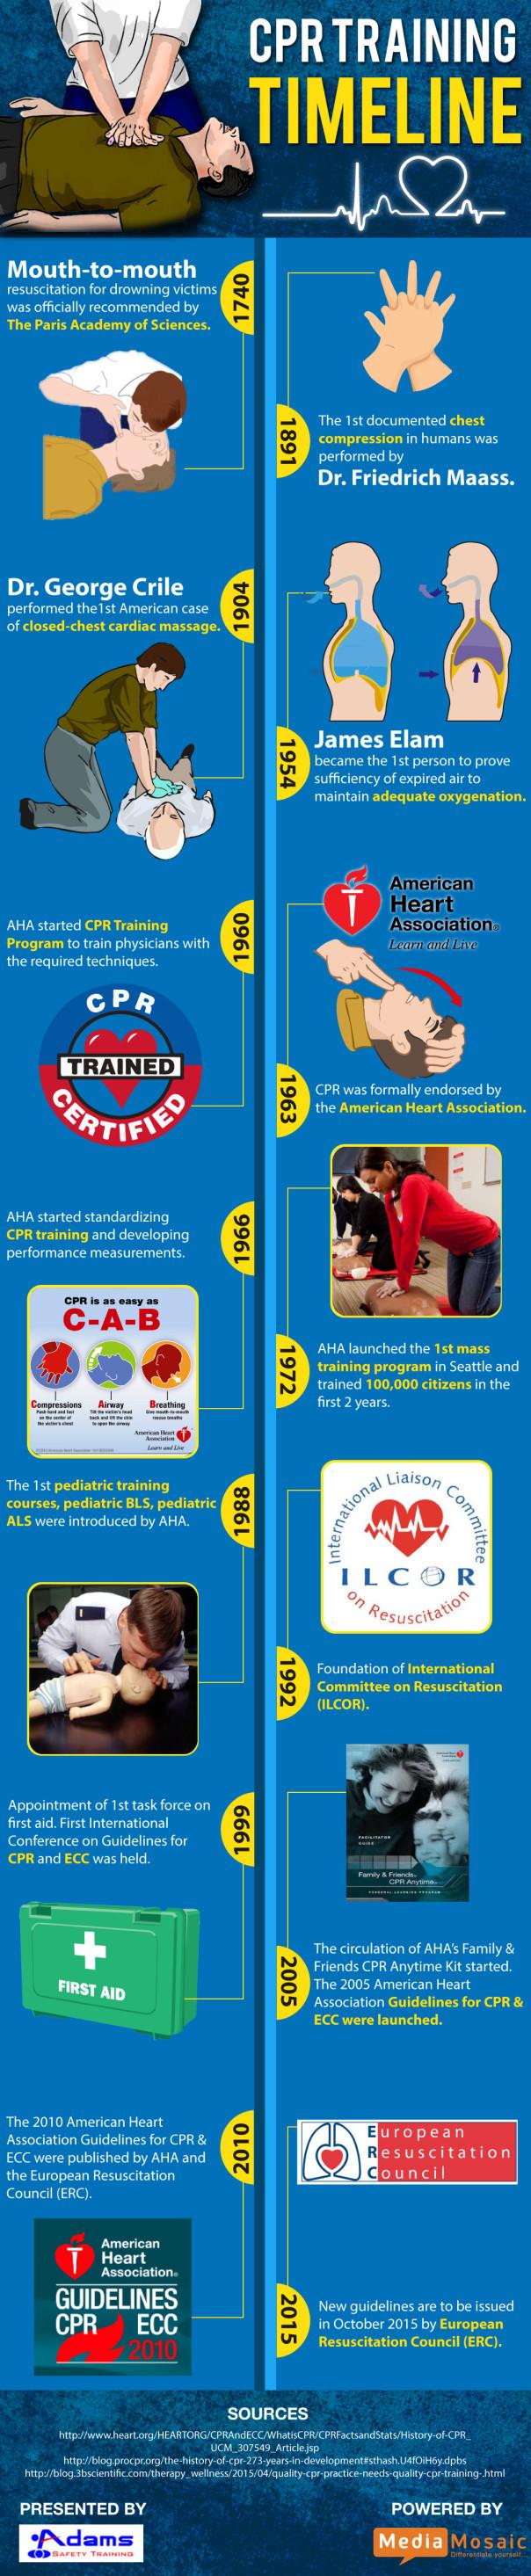 CPR Training Timeline